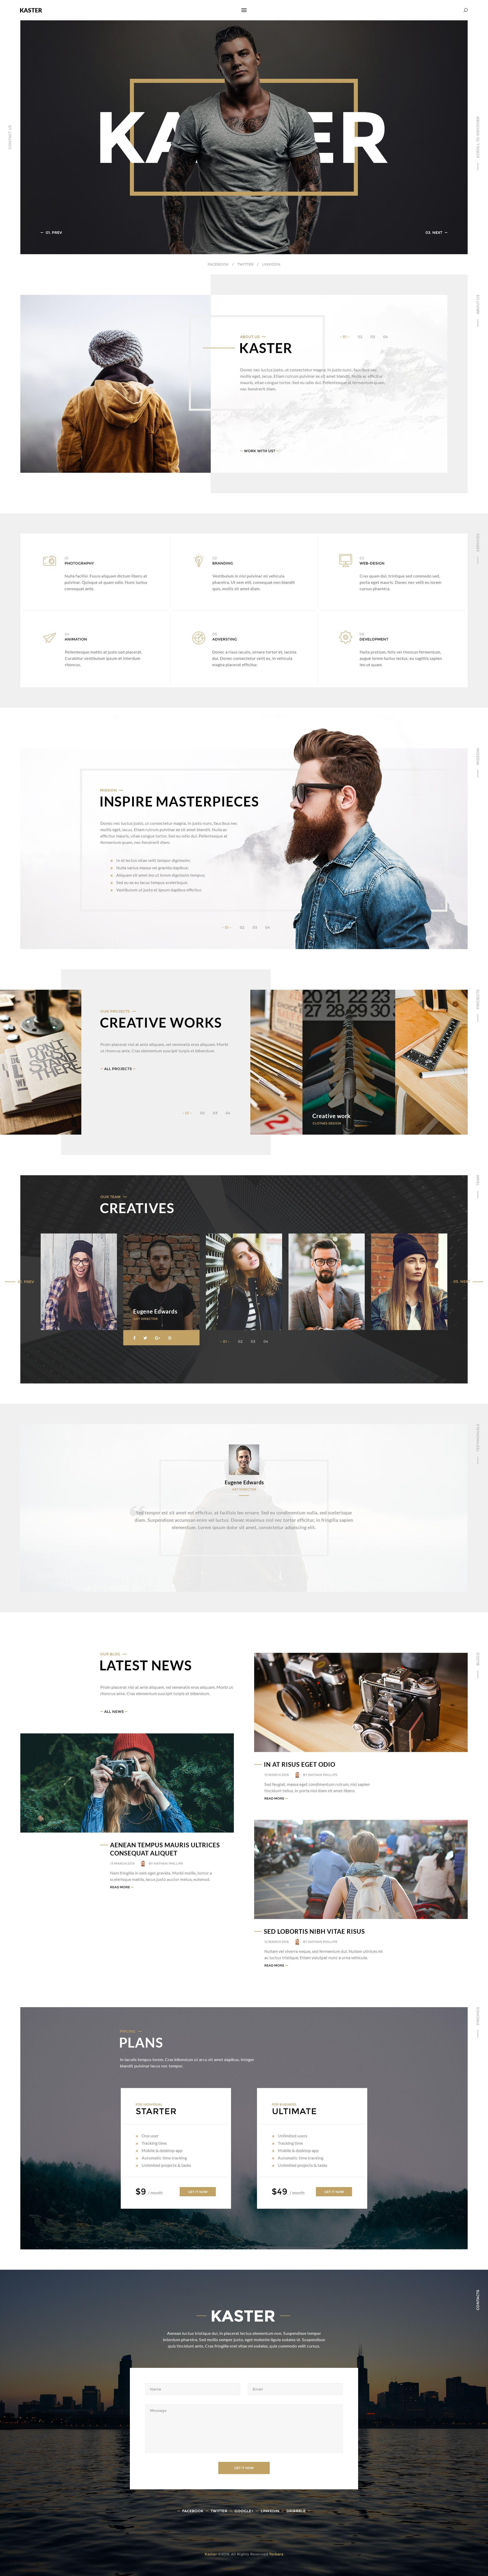 Company Portfolio Template Impressive Kaster — Multipurpose Creative Agency Personal Portfolio Modern .